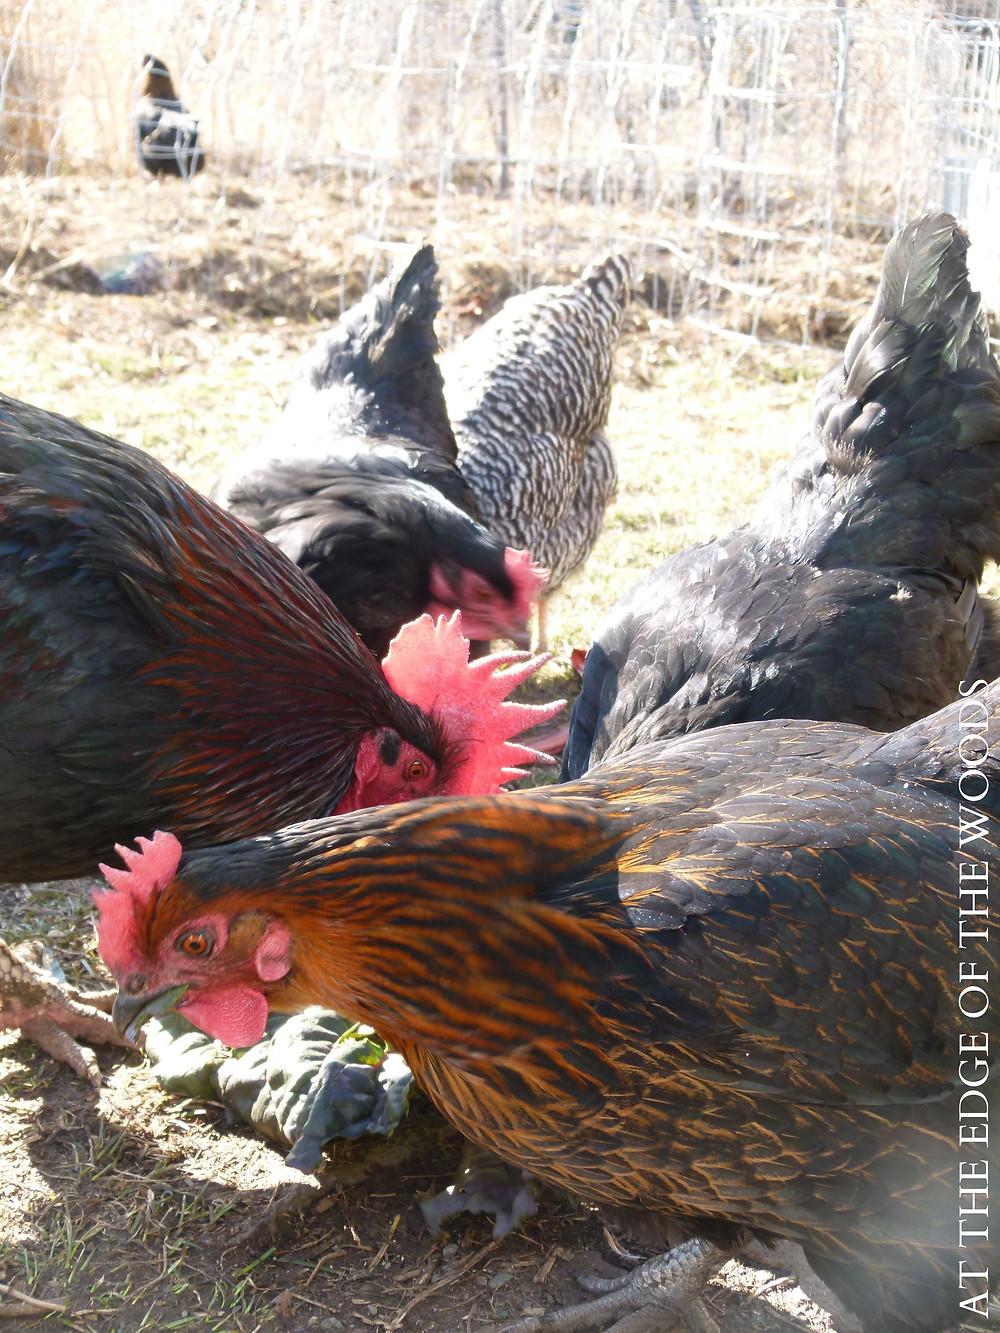 Black Star, Black Copper Marans, Australorp, and Barred Rock chickens